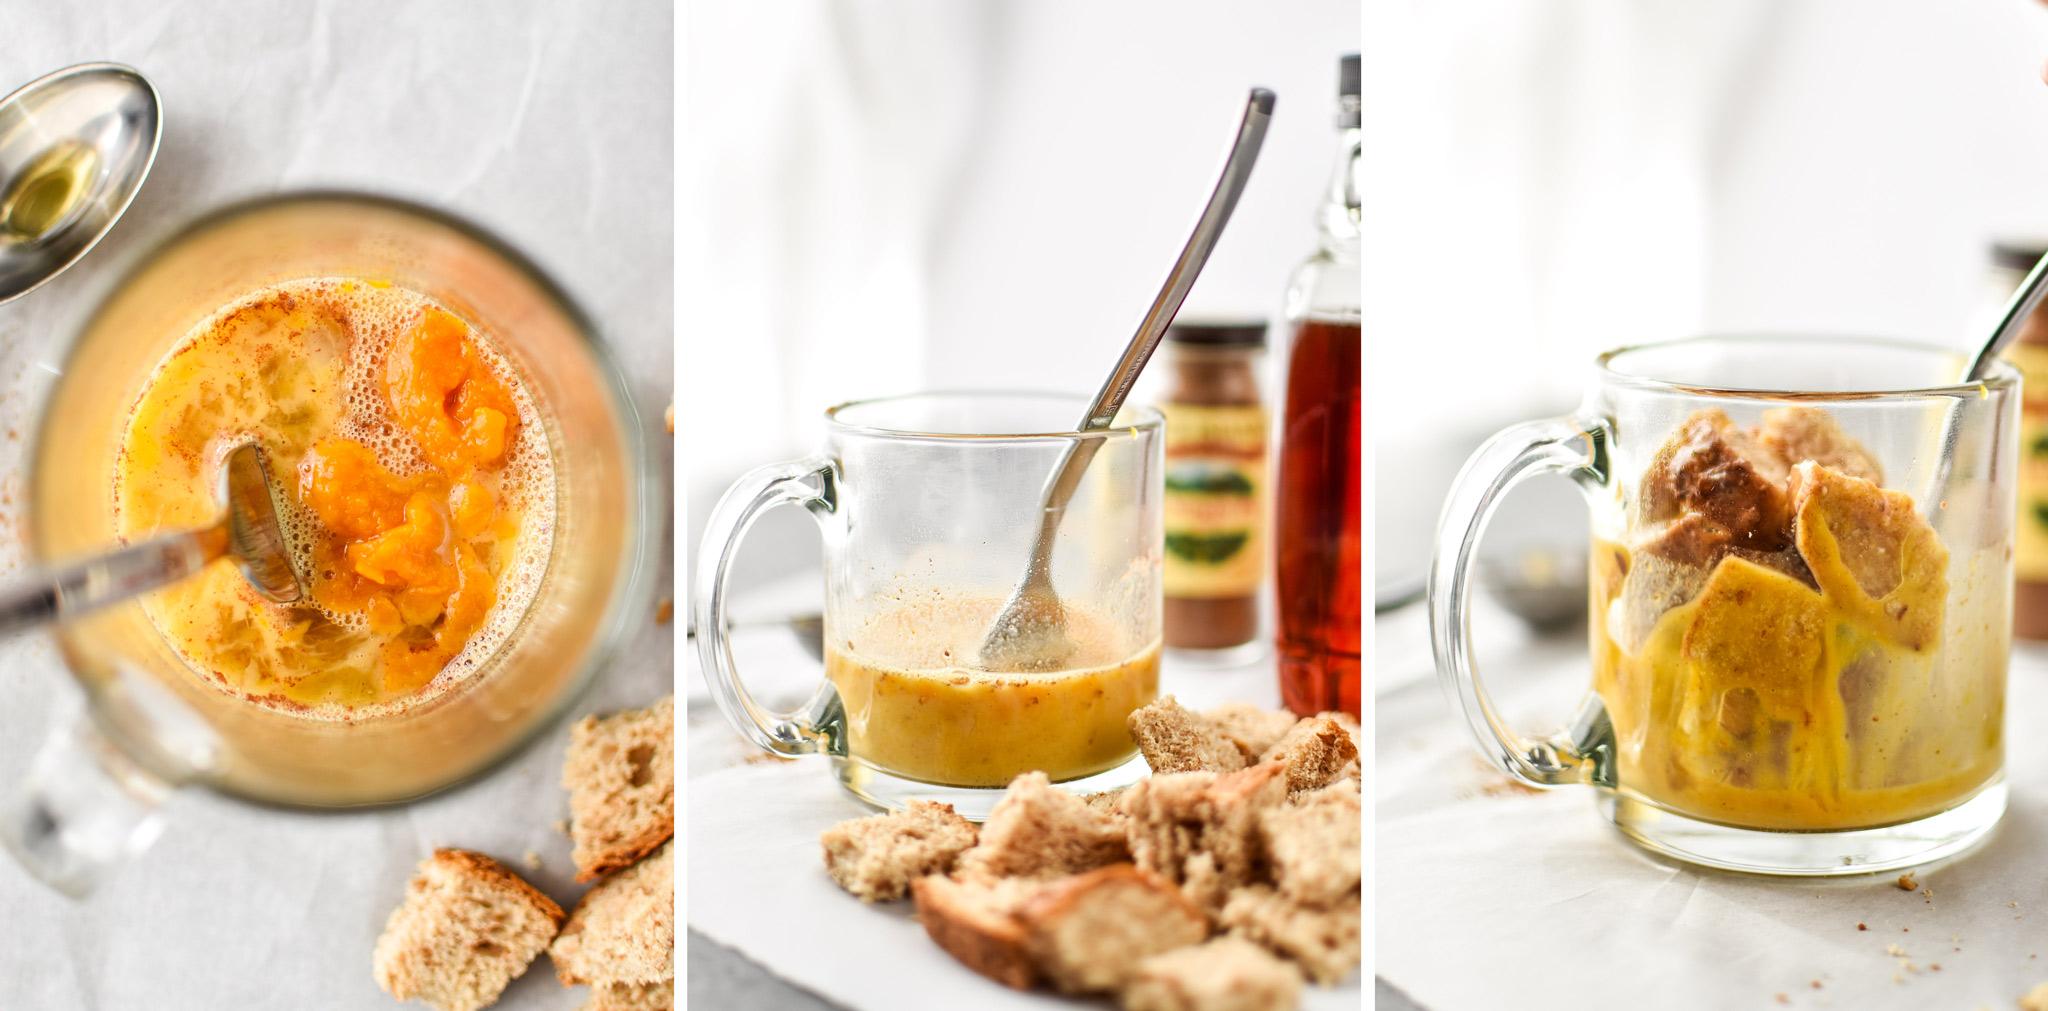 how to make the microwave mug french toast